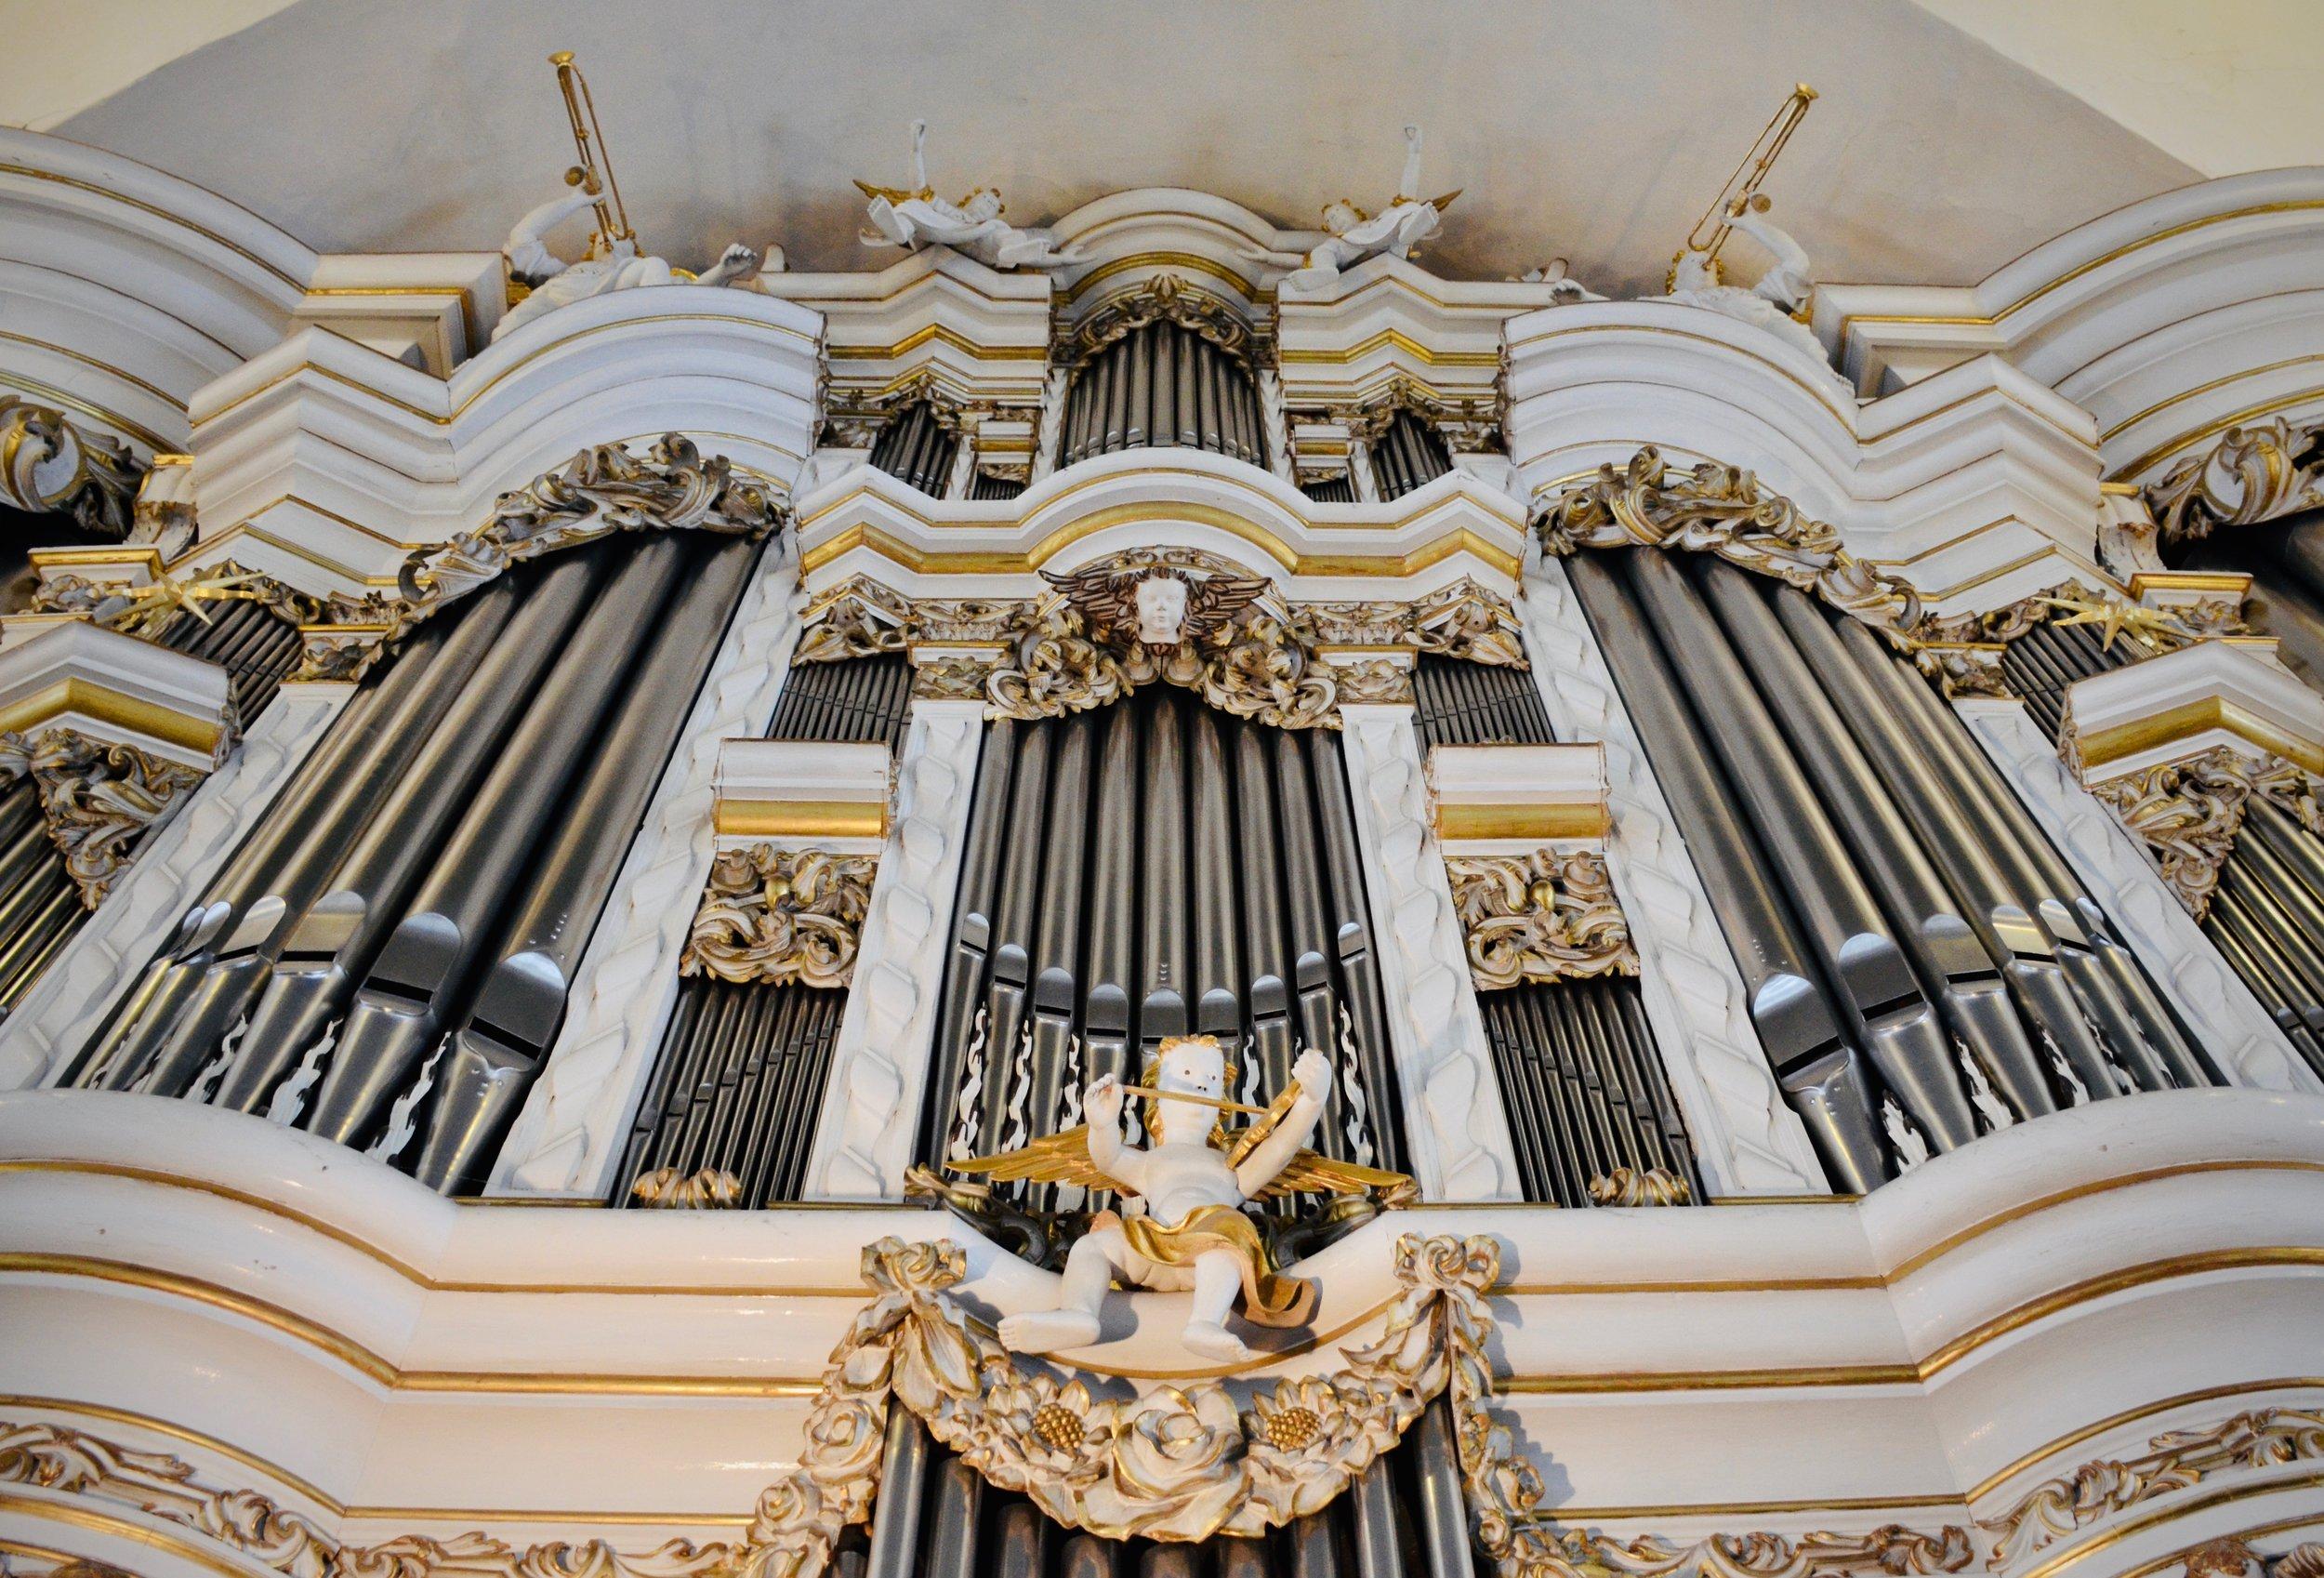 1730 Trost Organ, Stadtkirche, Waltershausen.